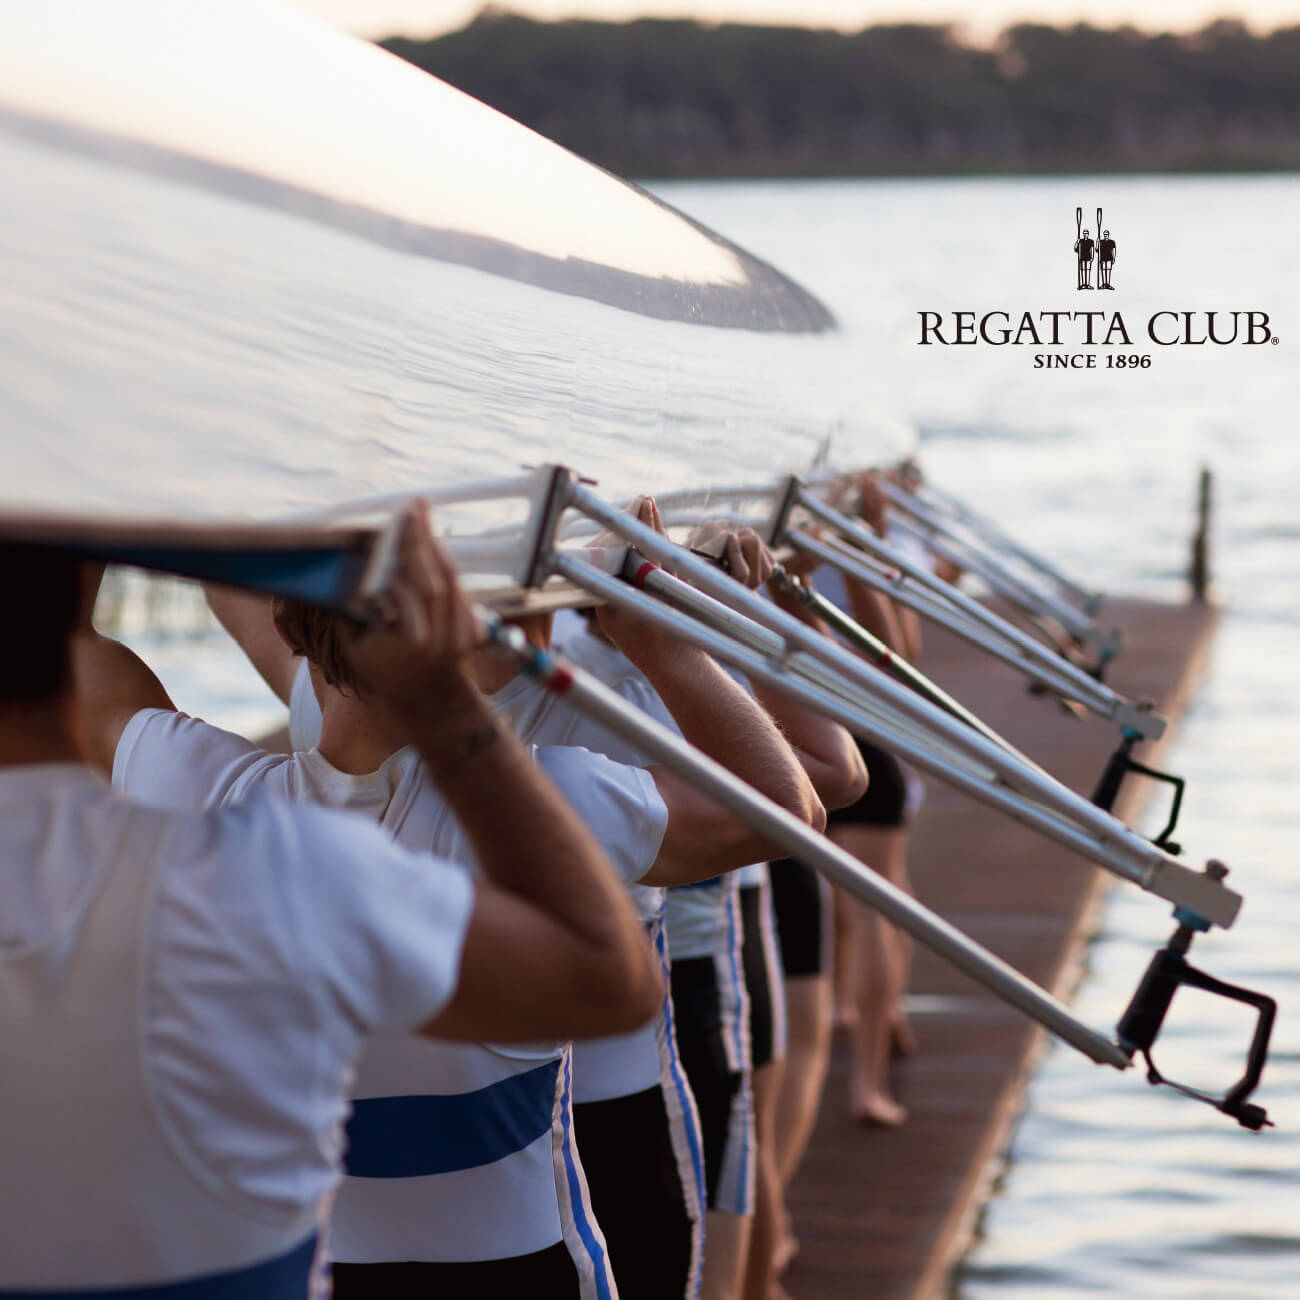 REGATTA CLUB(レガッタ クラブ)